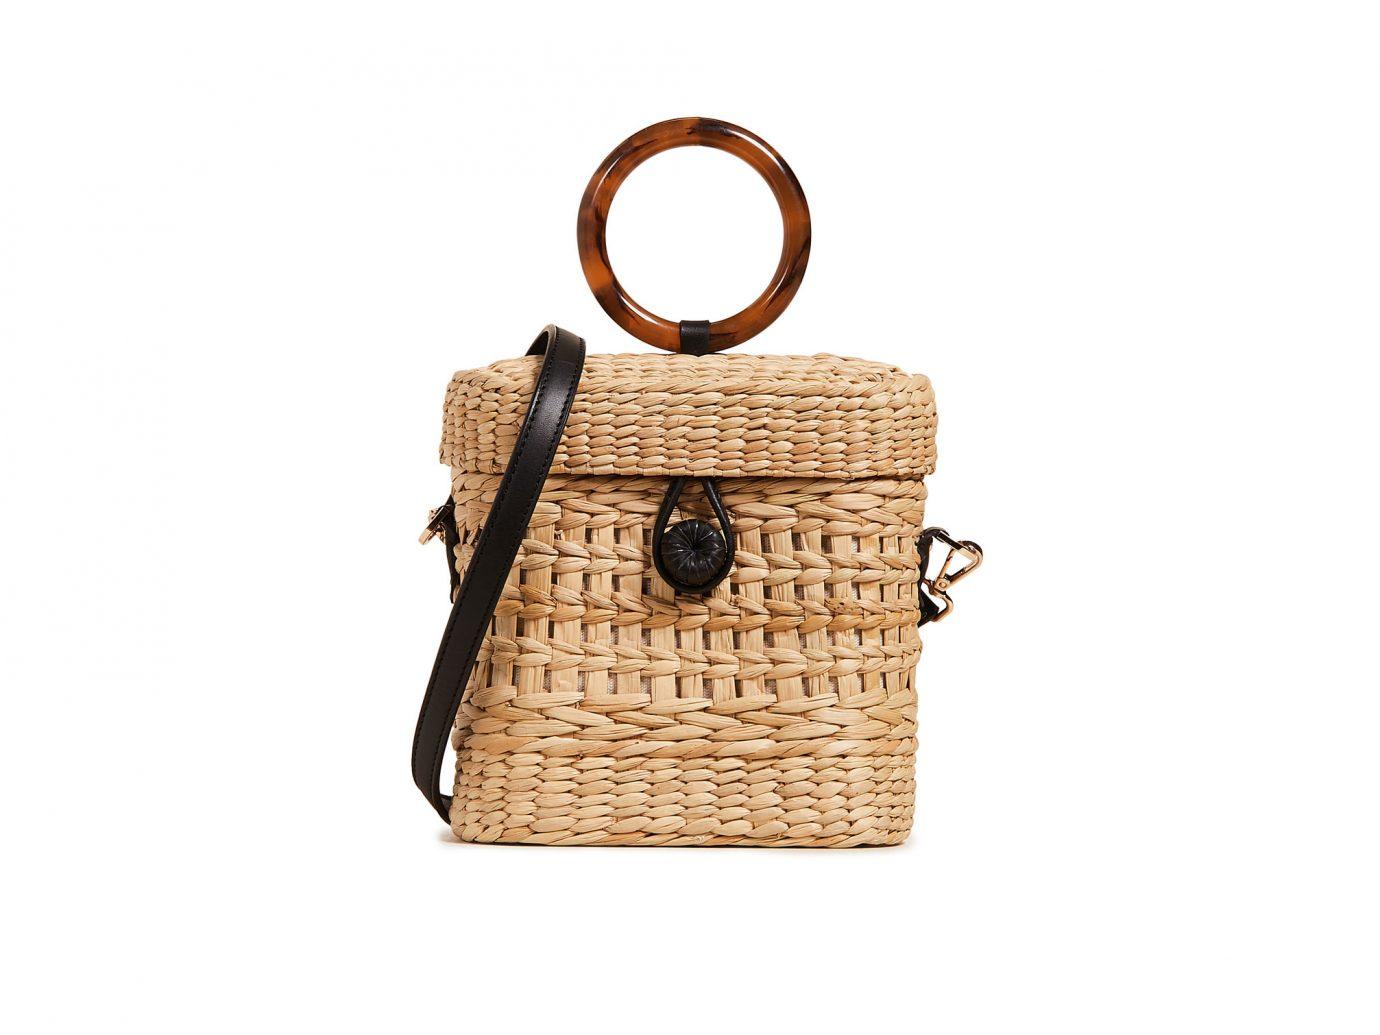 Poolside Bags The Ashleigh Bag